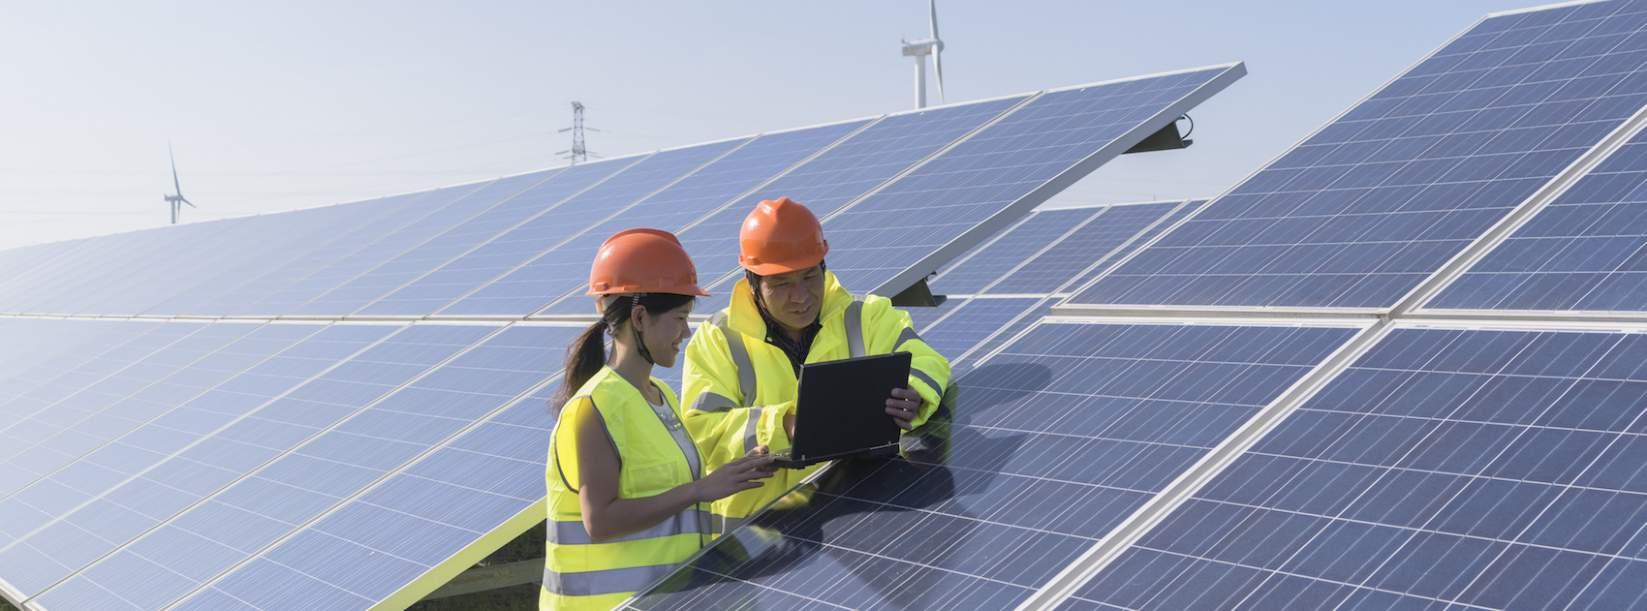 Monitoring solar energy